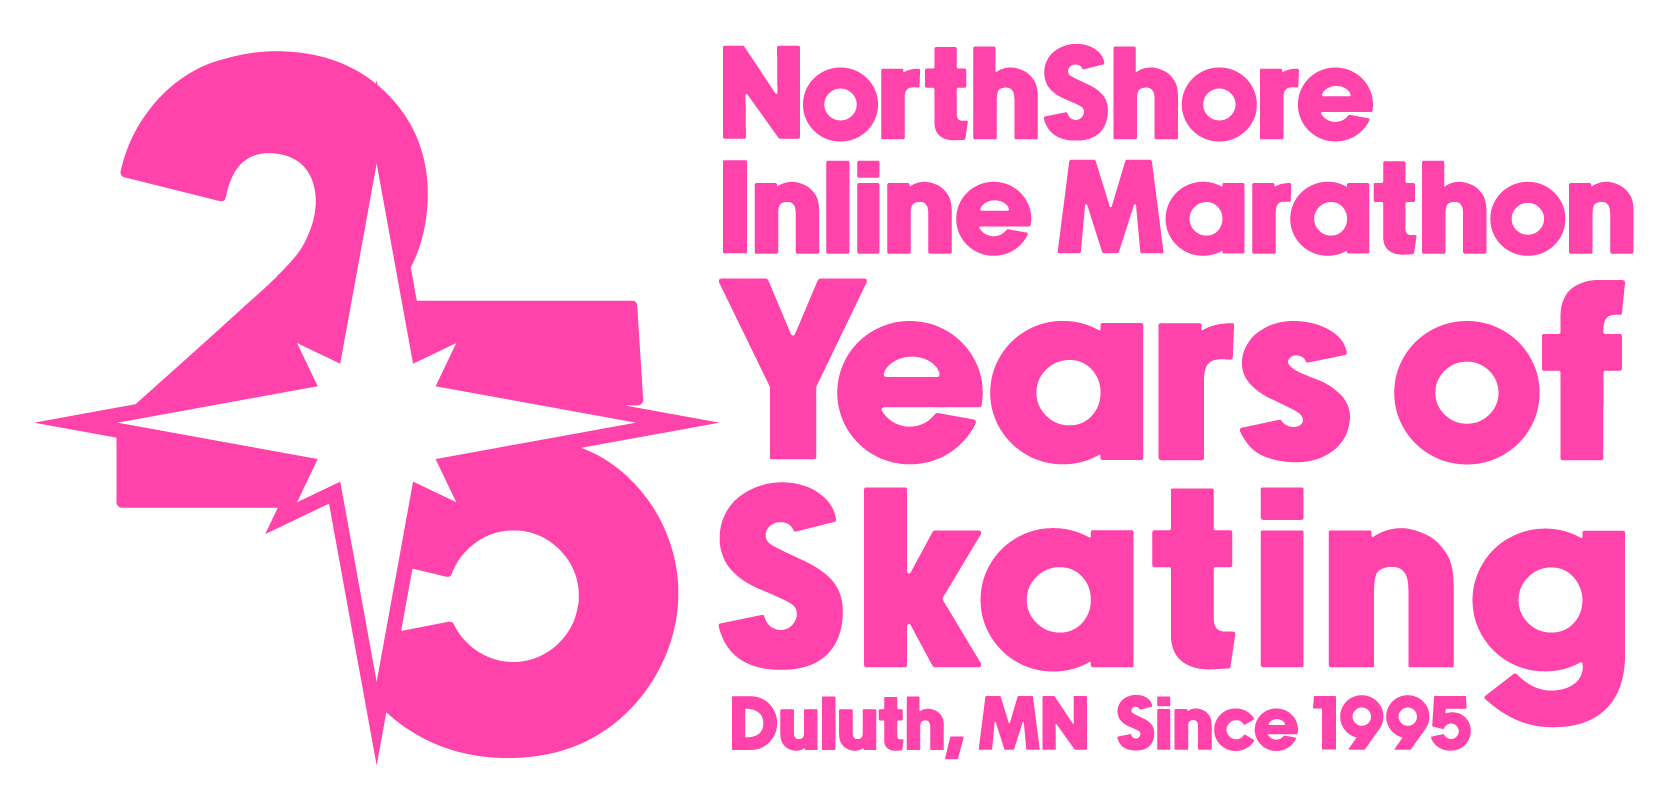 NorthShore Inline Marathon - 25 Years of Skating - Duluth, MN Since 1995